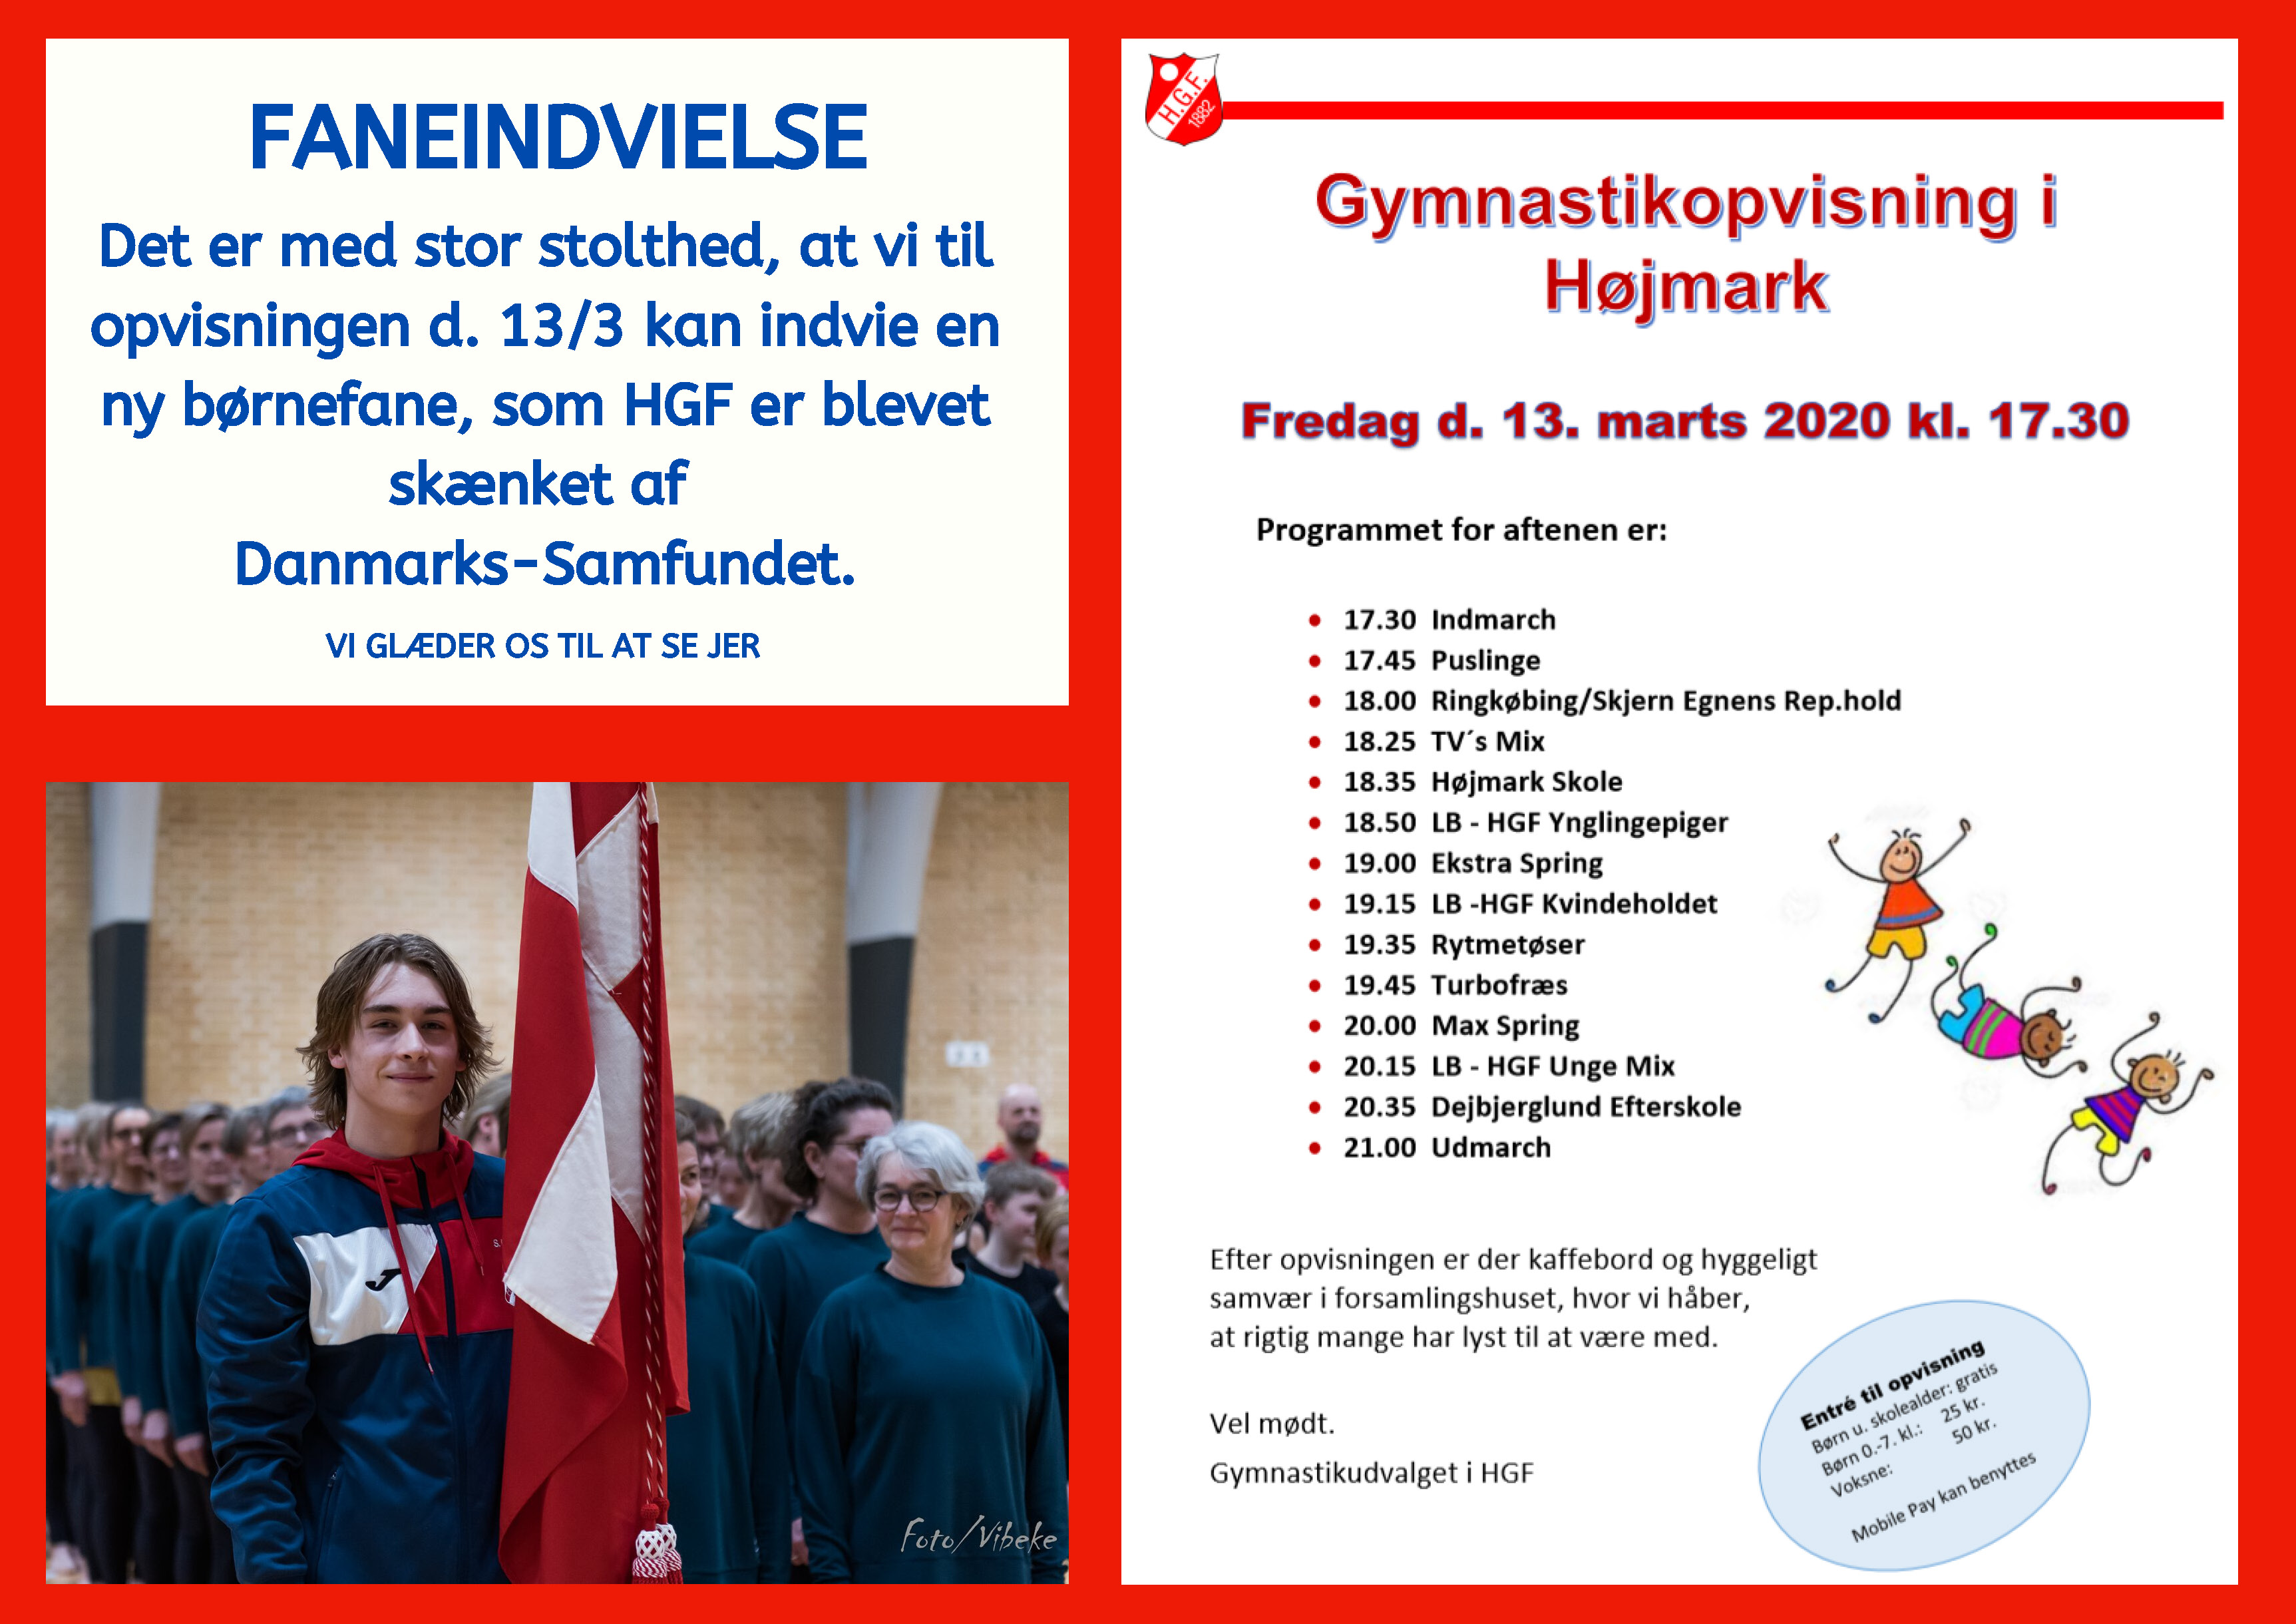 Gymnastikopvisning i Højmark 2020 @ Højmark Hal og Forsamlingshus